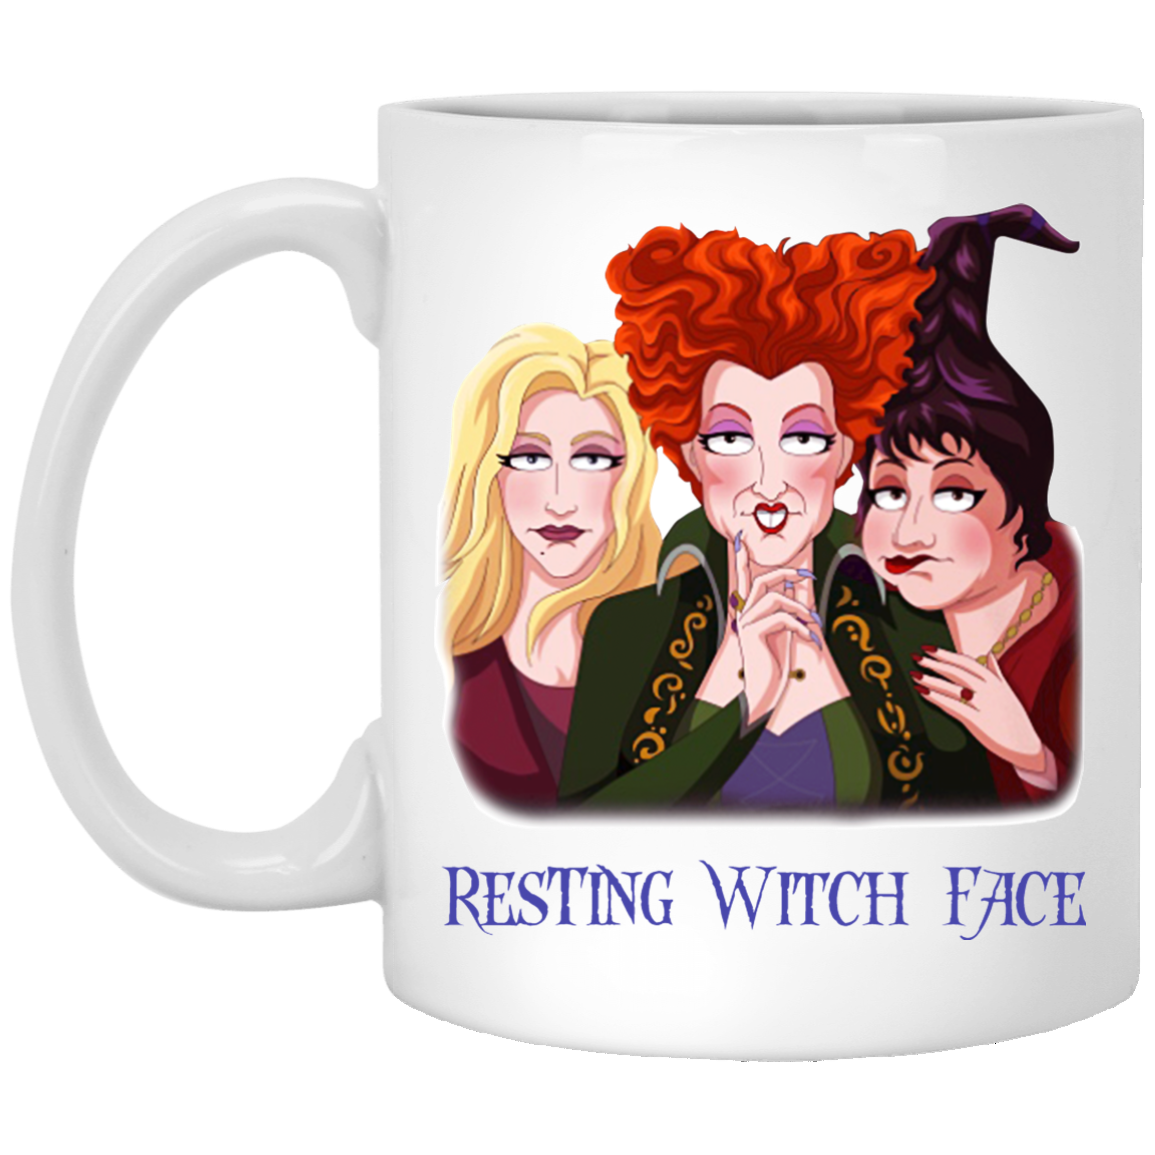 image 16 - Sanderson Sisters Resting Witch Face Hocus Pocus mug